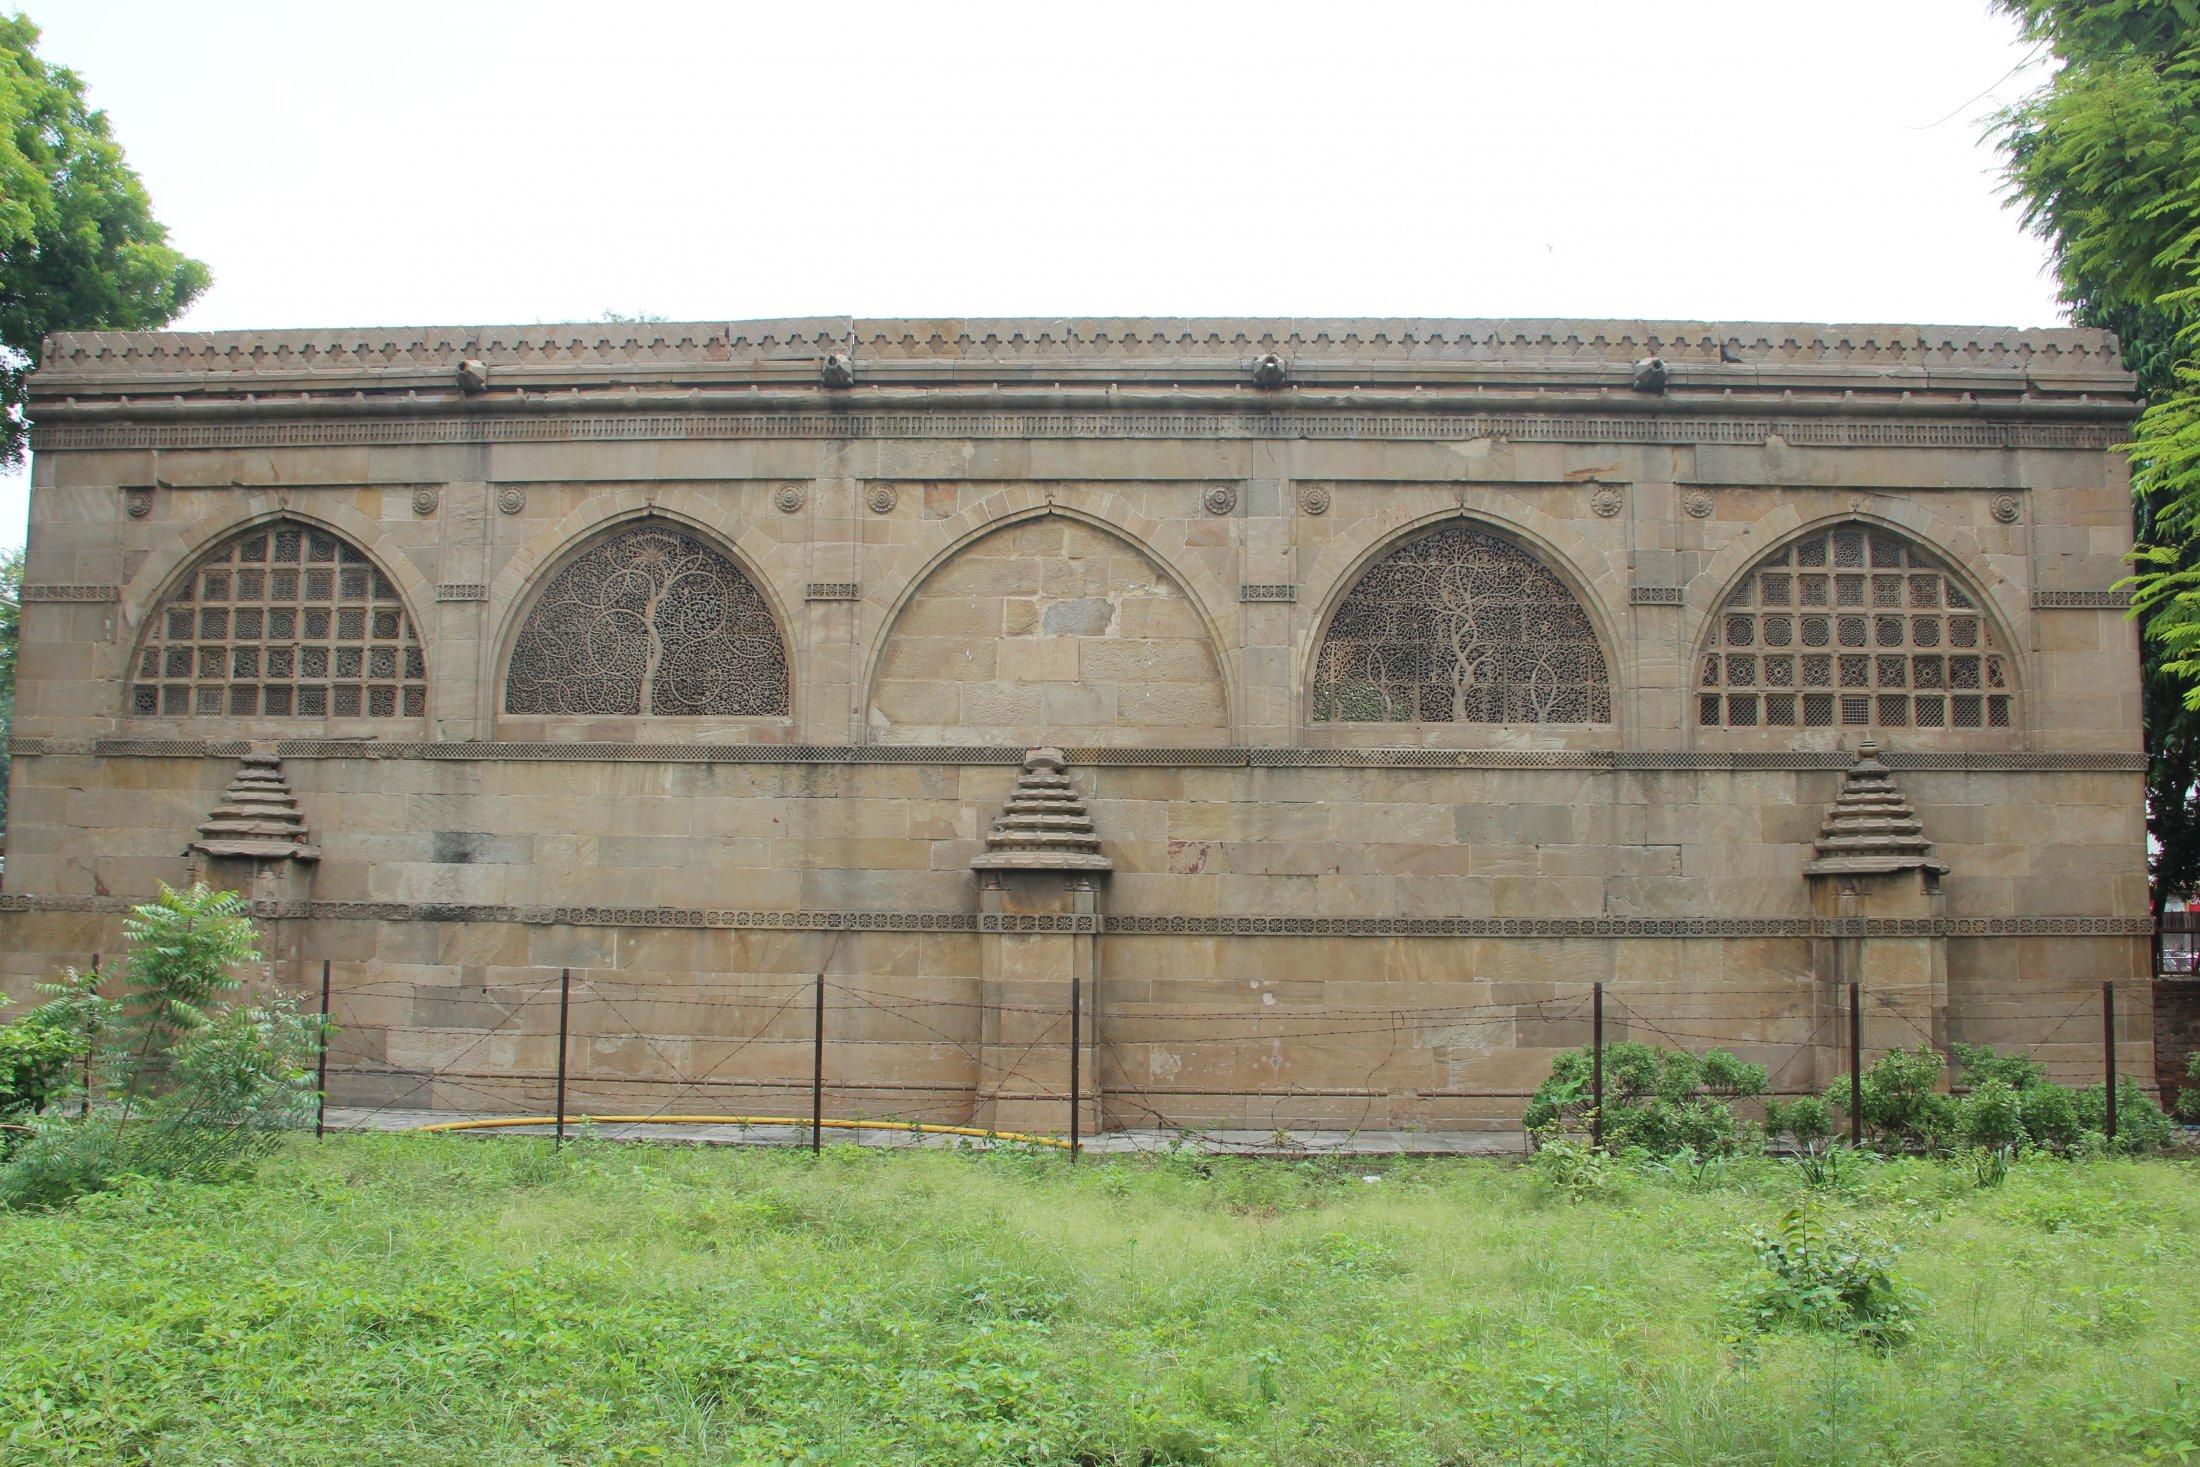 Sidi Sayed Mosque, Ahmedabad